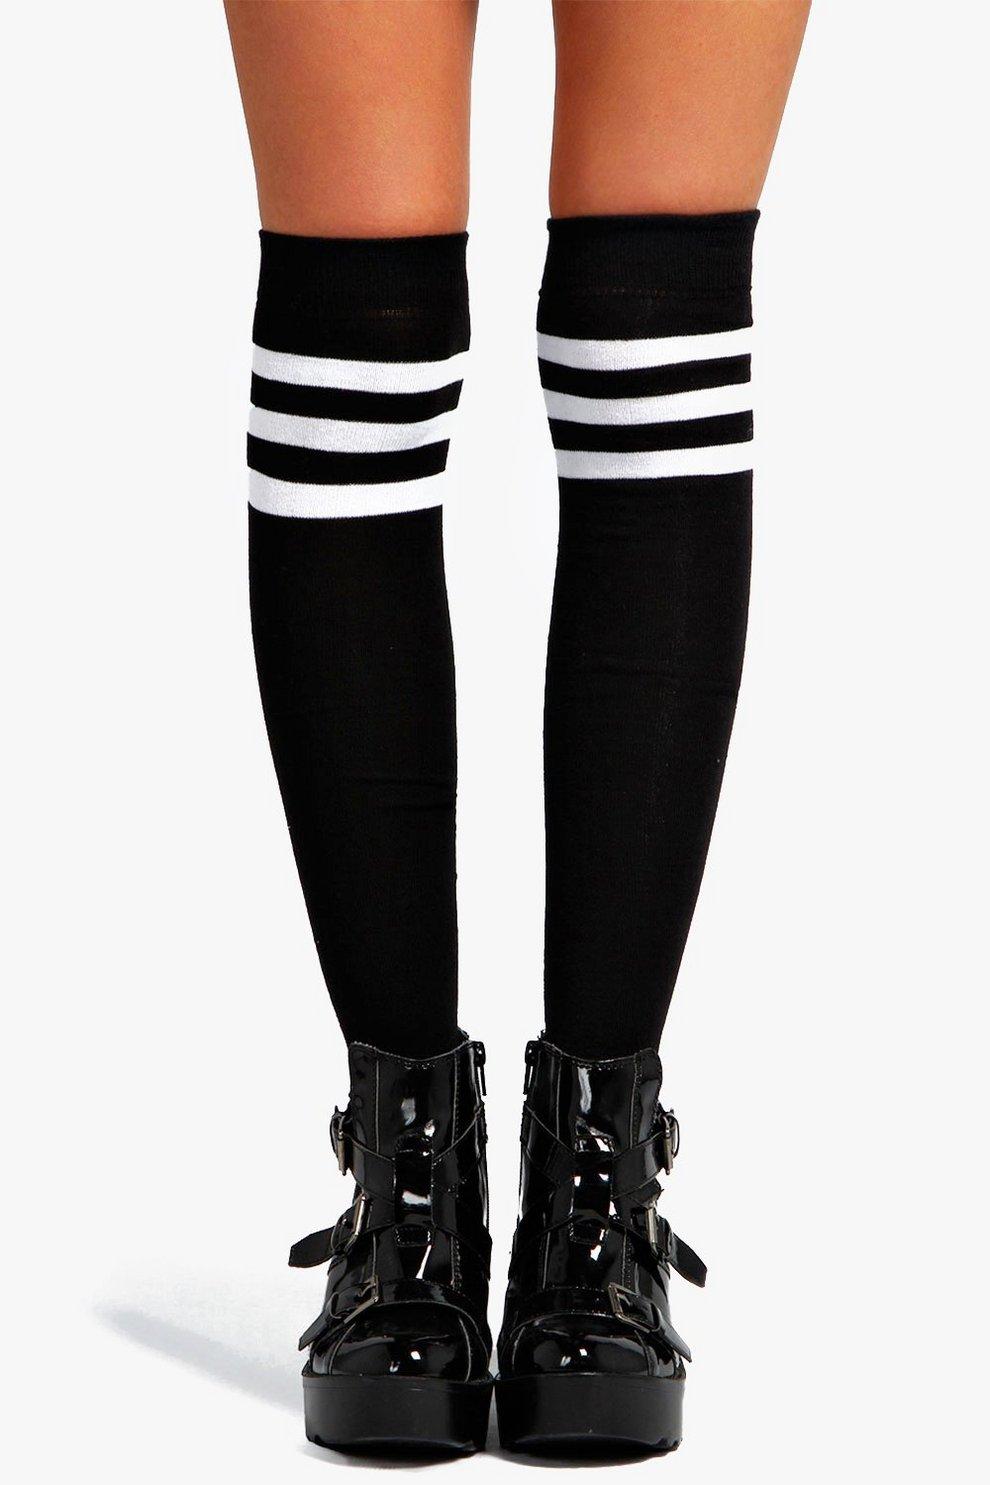 b6a29cb7f Womens Black Stripe Top Knee High Socks